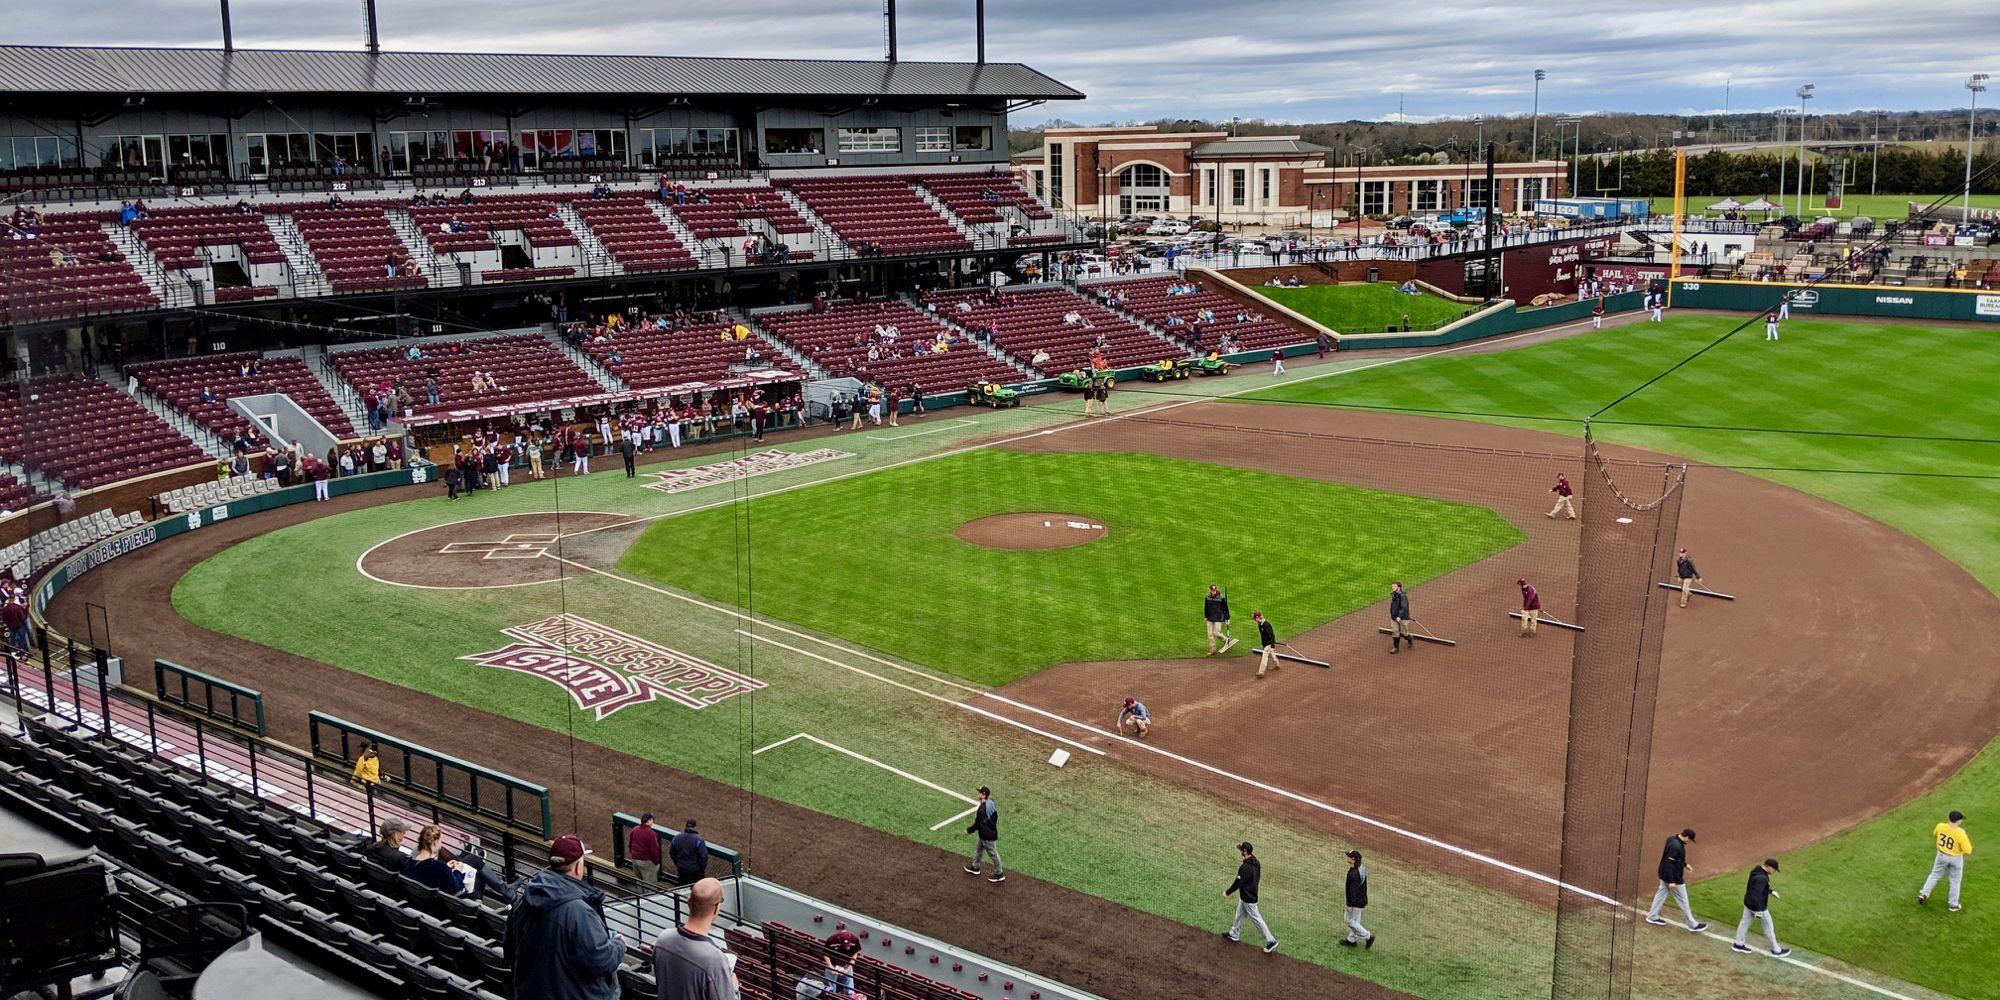 New Dudy Noble Field Google Search Baseball Stadium Baseball Field Field